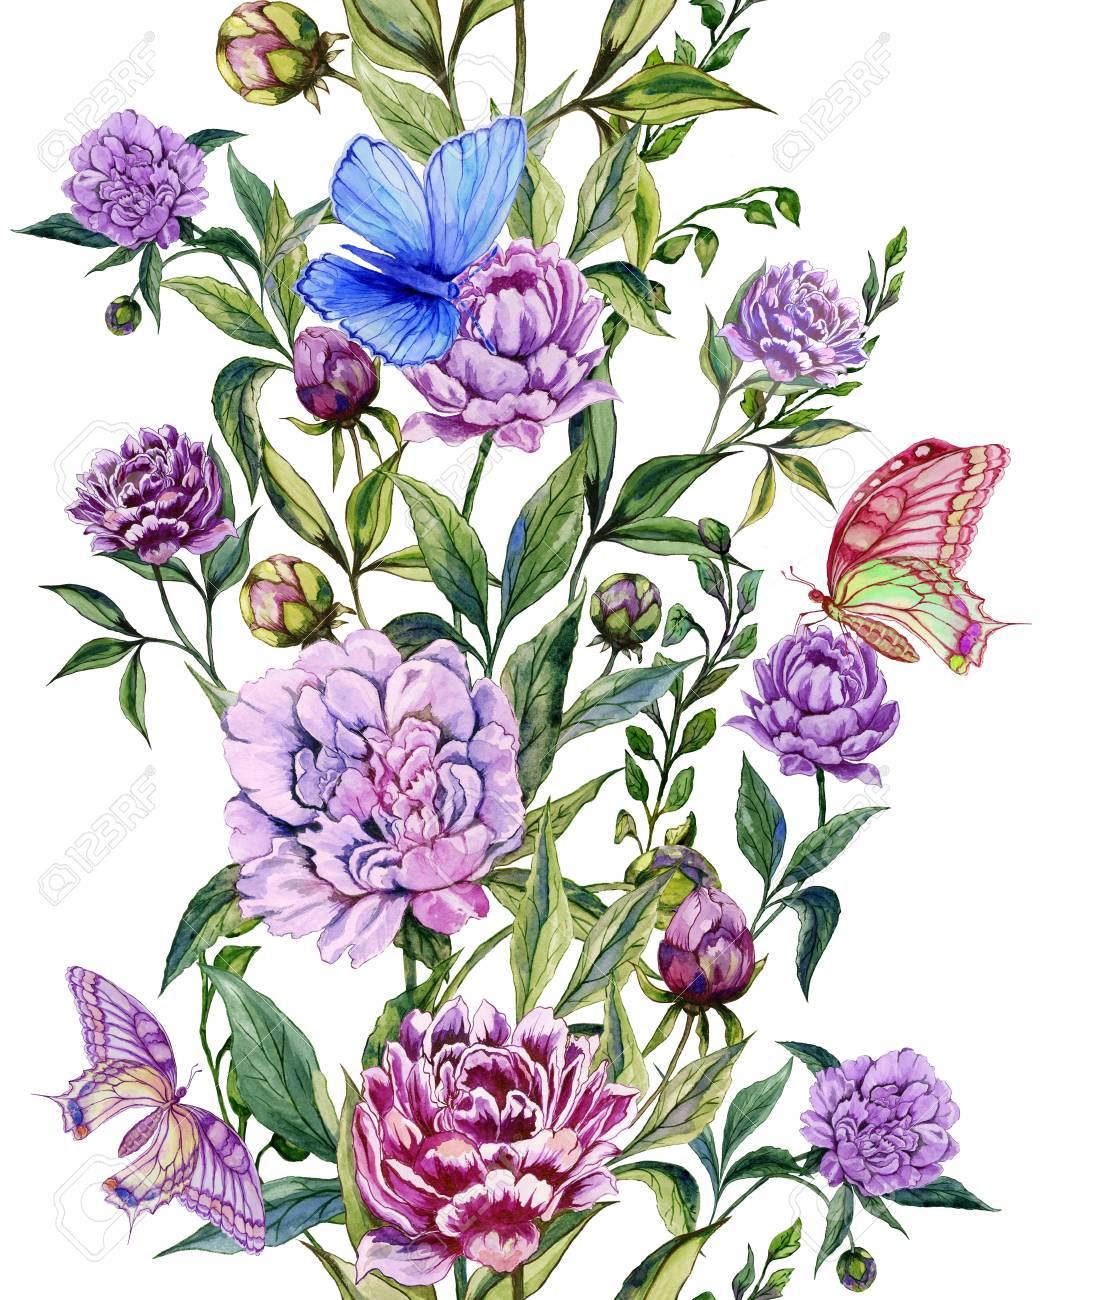 Beautiful purple peony flowers on a stems with green leaves and beautiful purple peony flowers on a stems with green leaves and bright butterflies sitting on them mightylinksfo